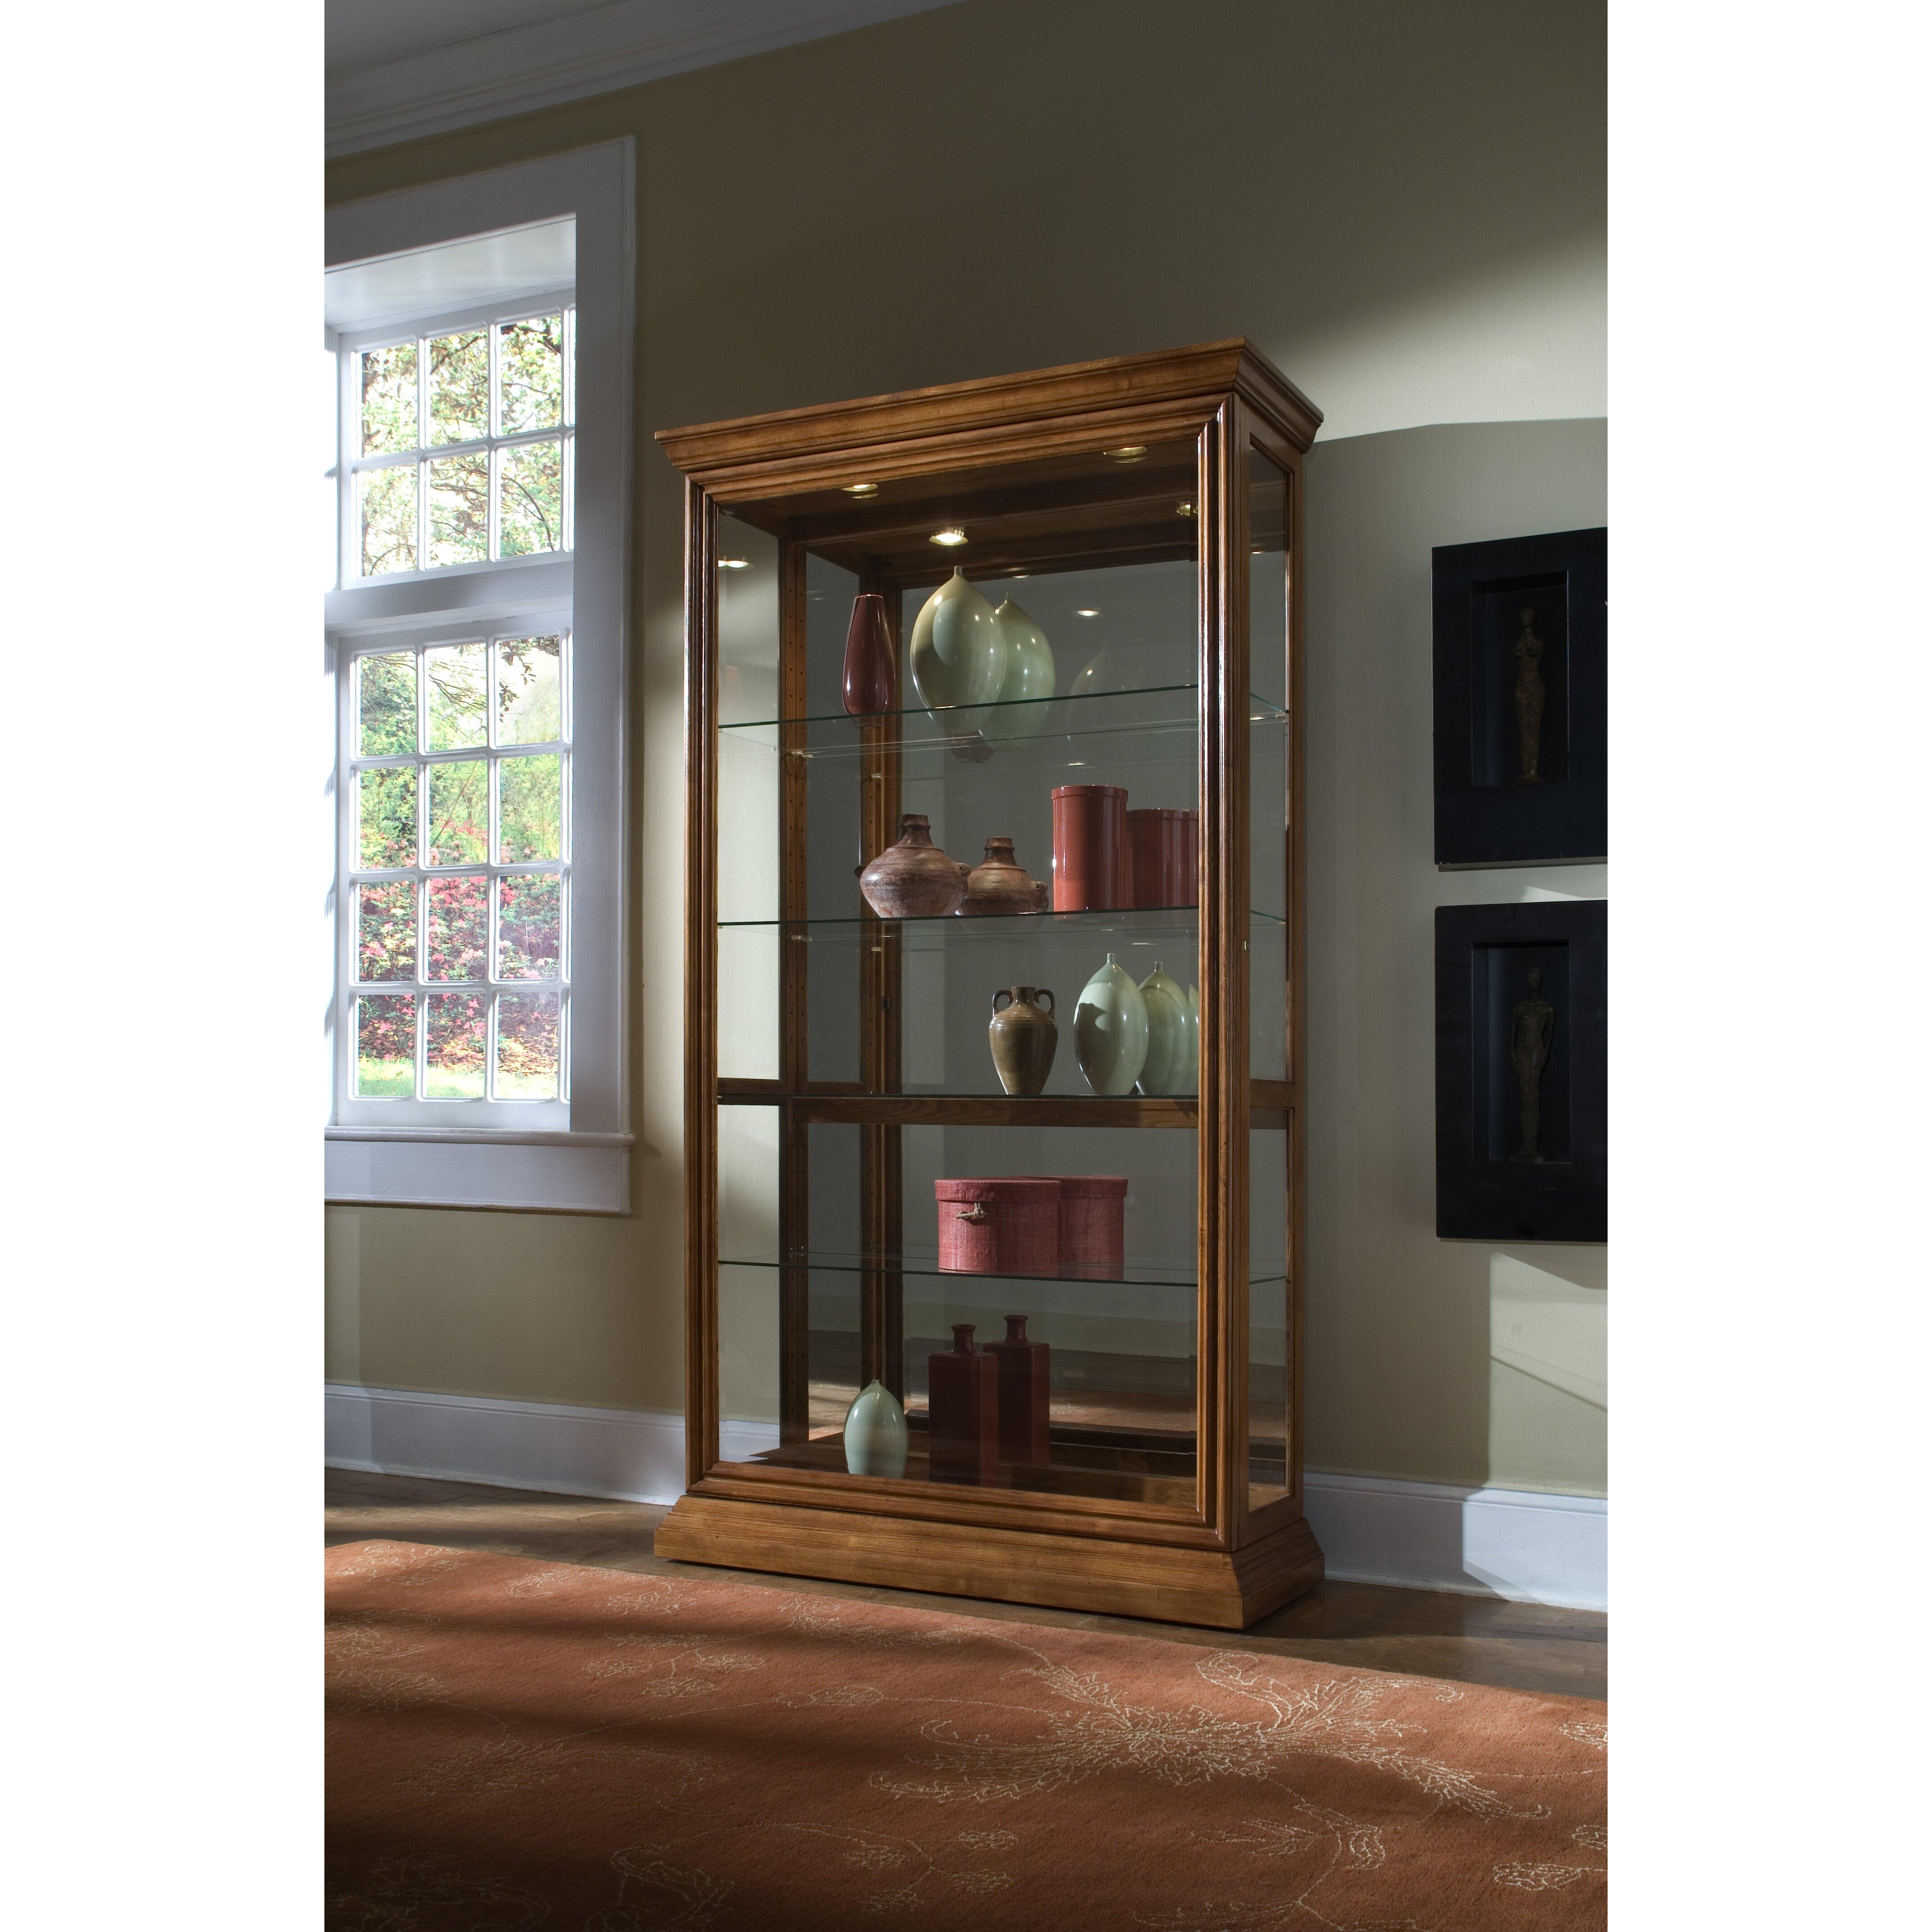 Pulaski keepsakes curio cabinet reviews wayfair supply for Pulaski furniture